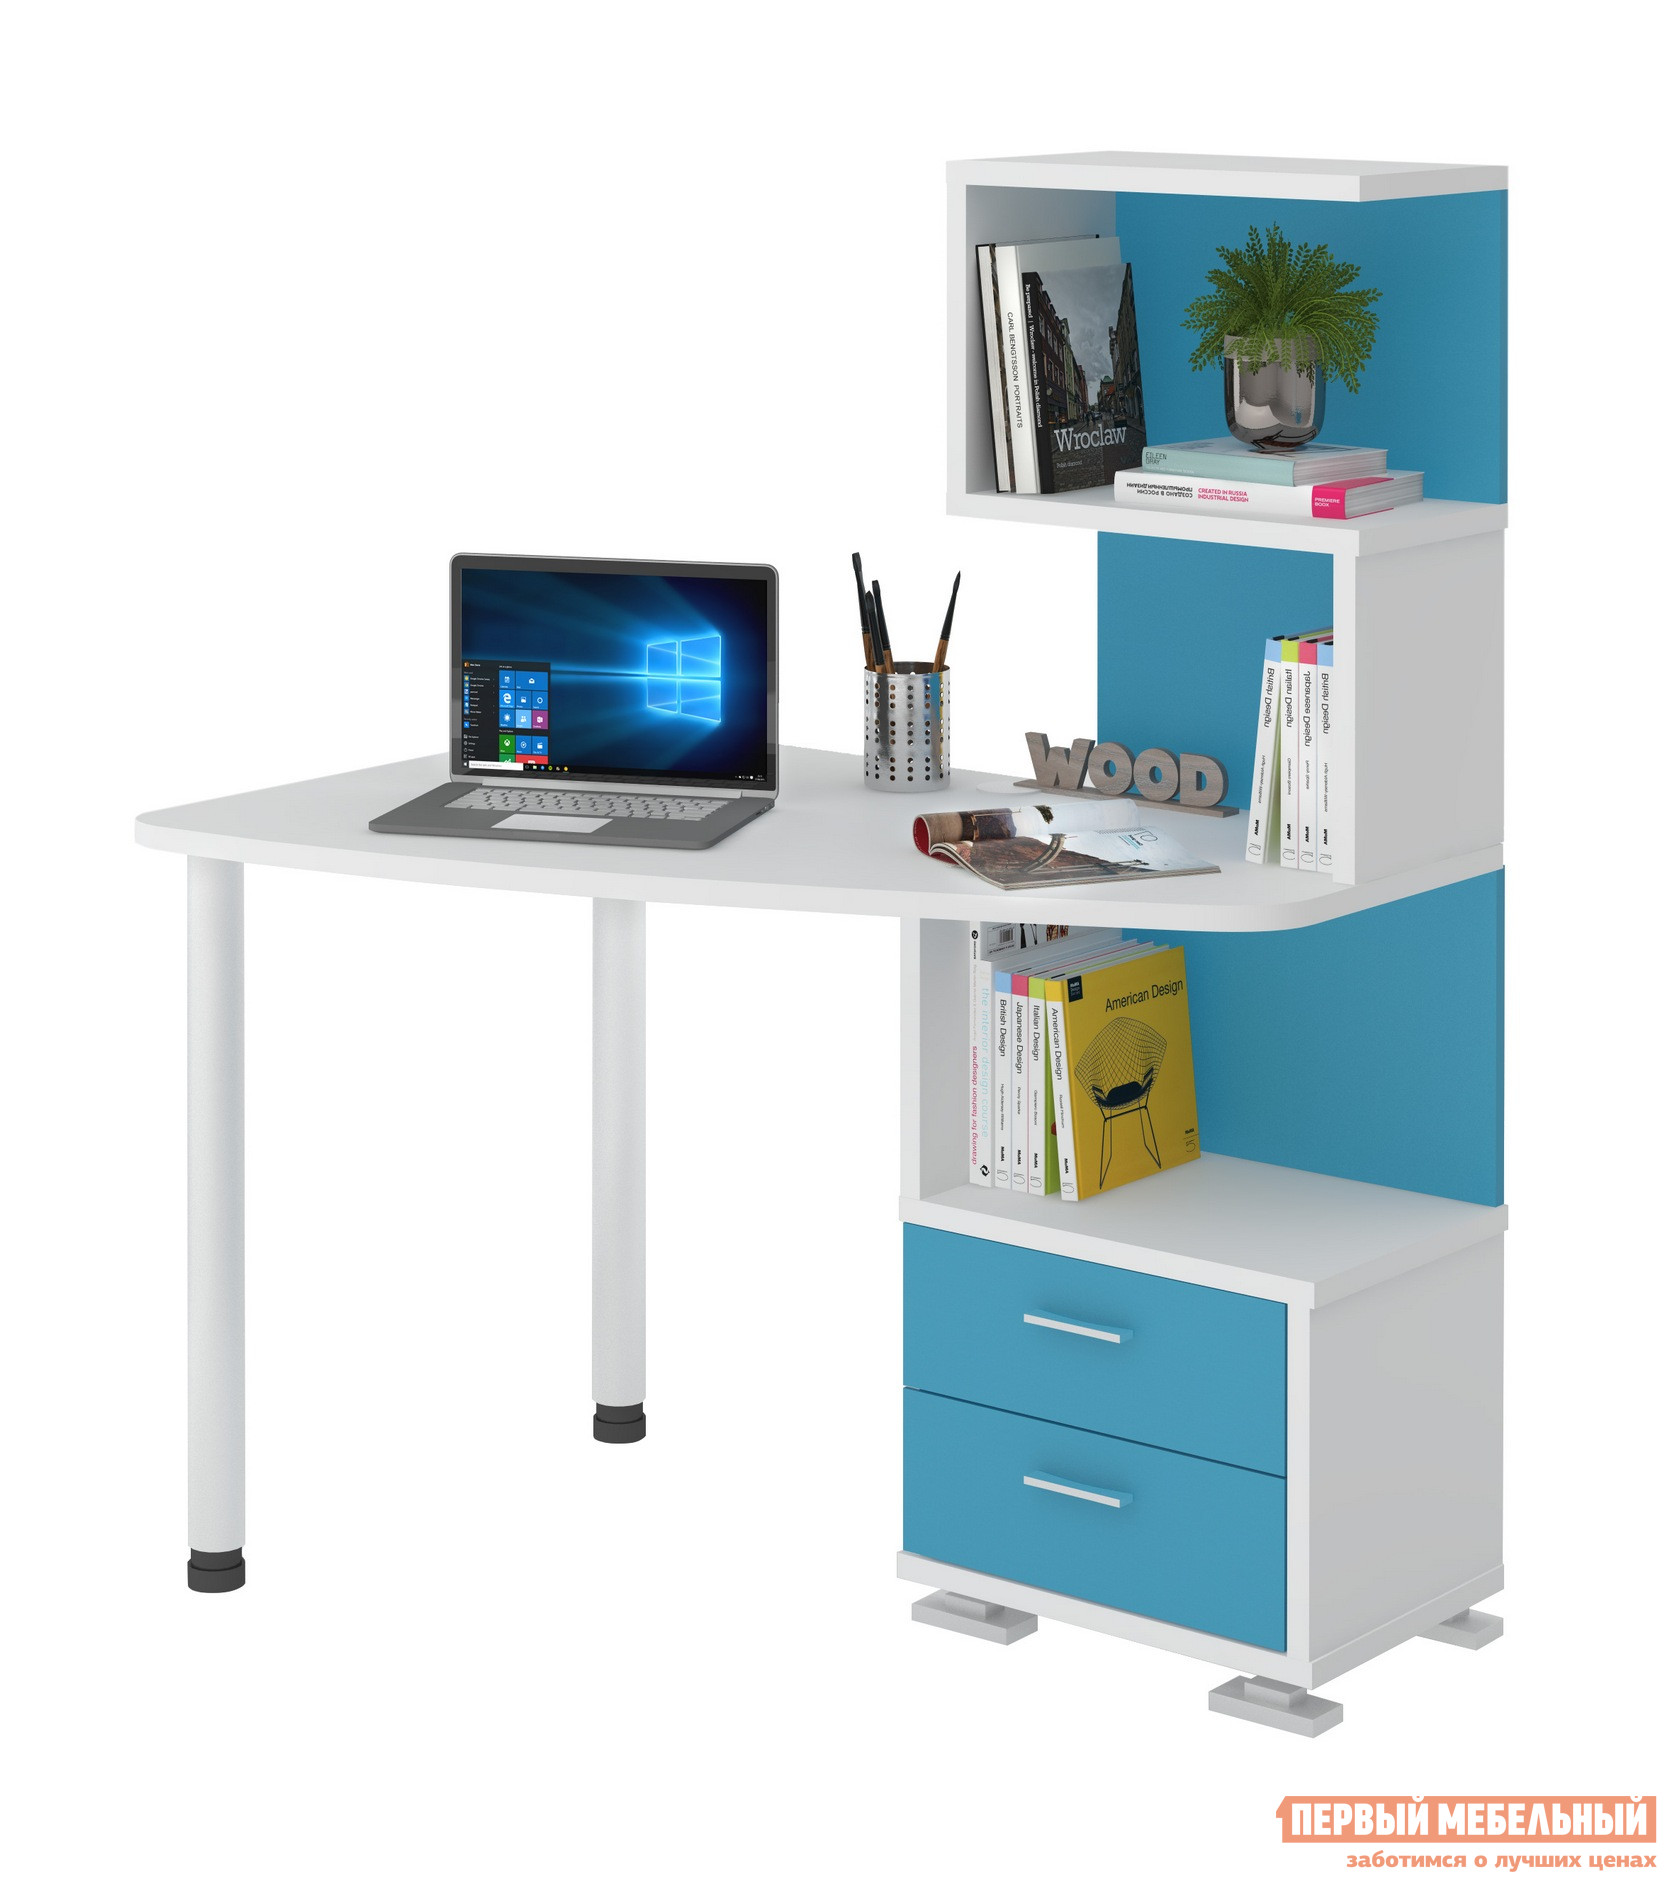 Компьютерный стол детский Мэрдэс СКМ-60